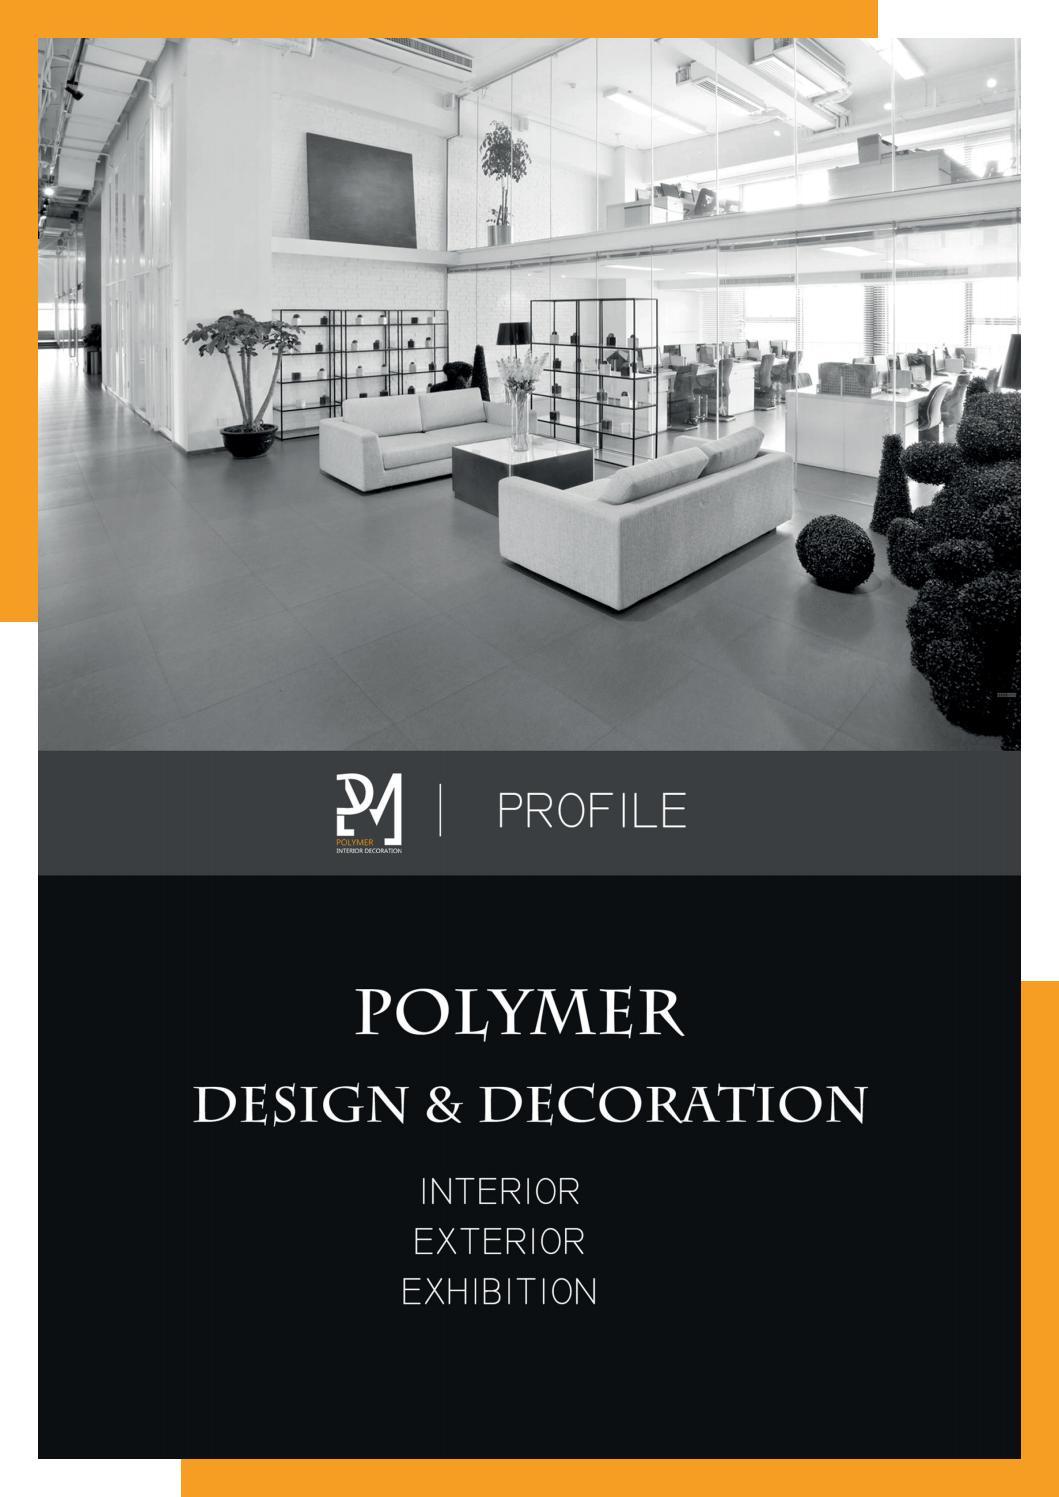 Polymer Interior Decoration Company Profile 2019 By Maraandreavs Issuu